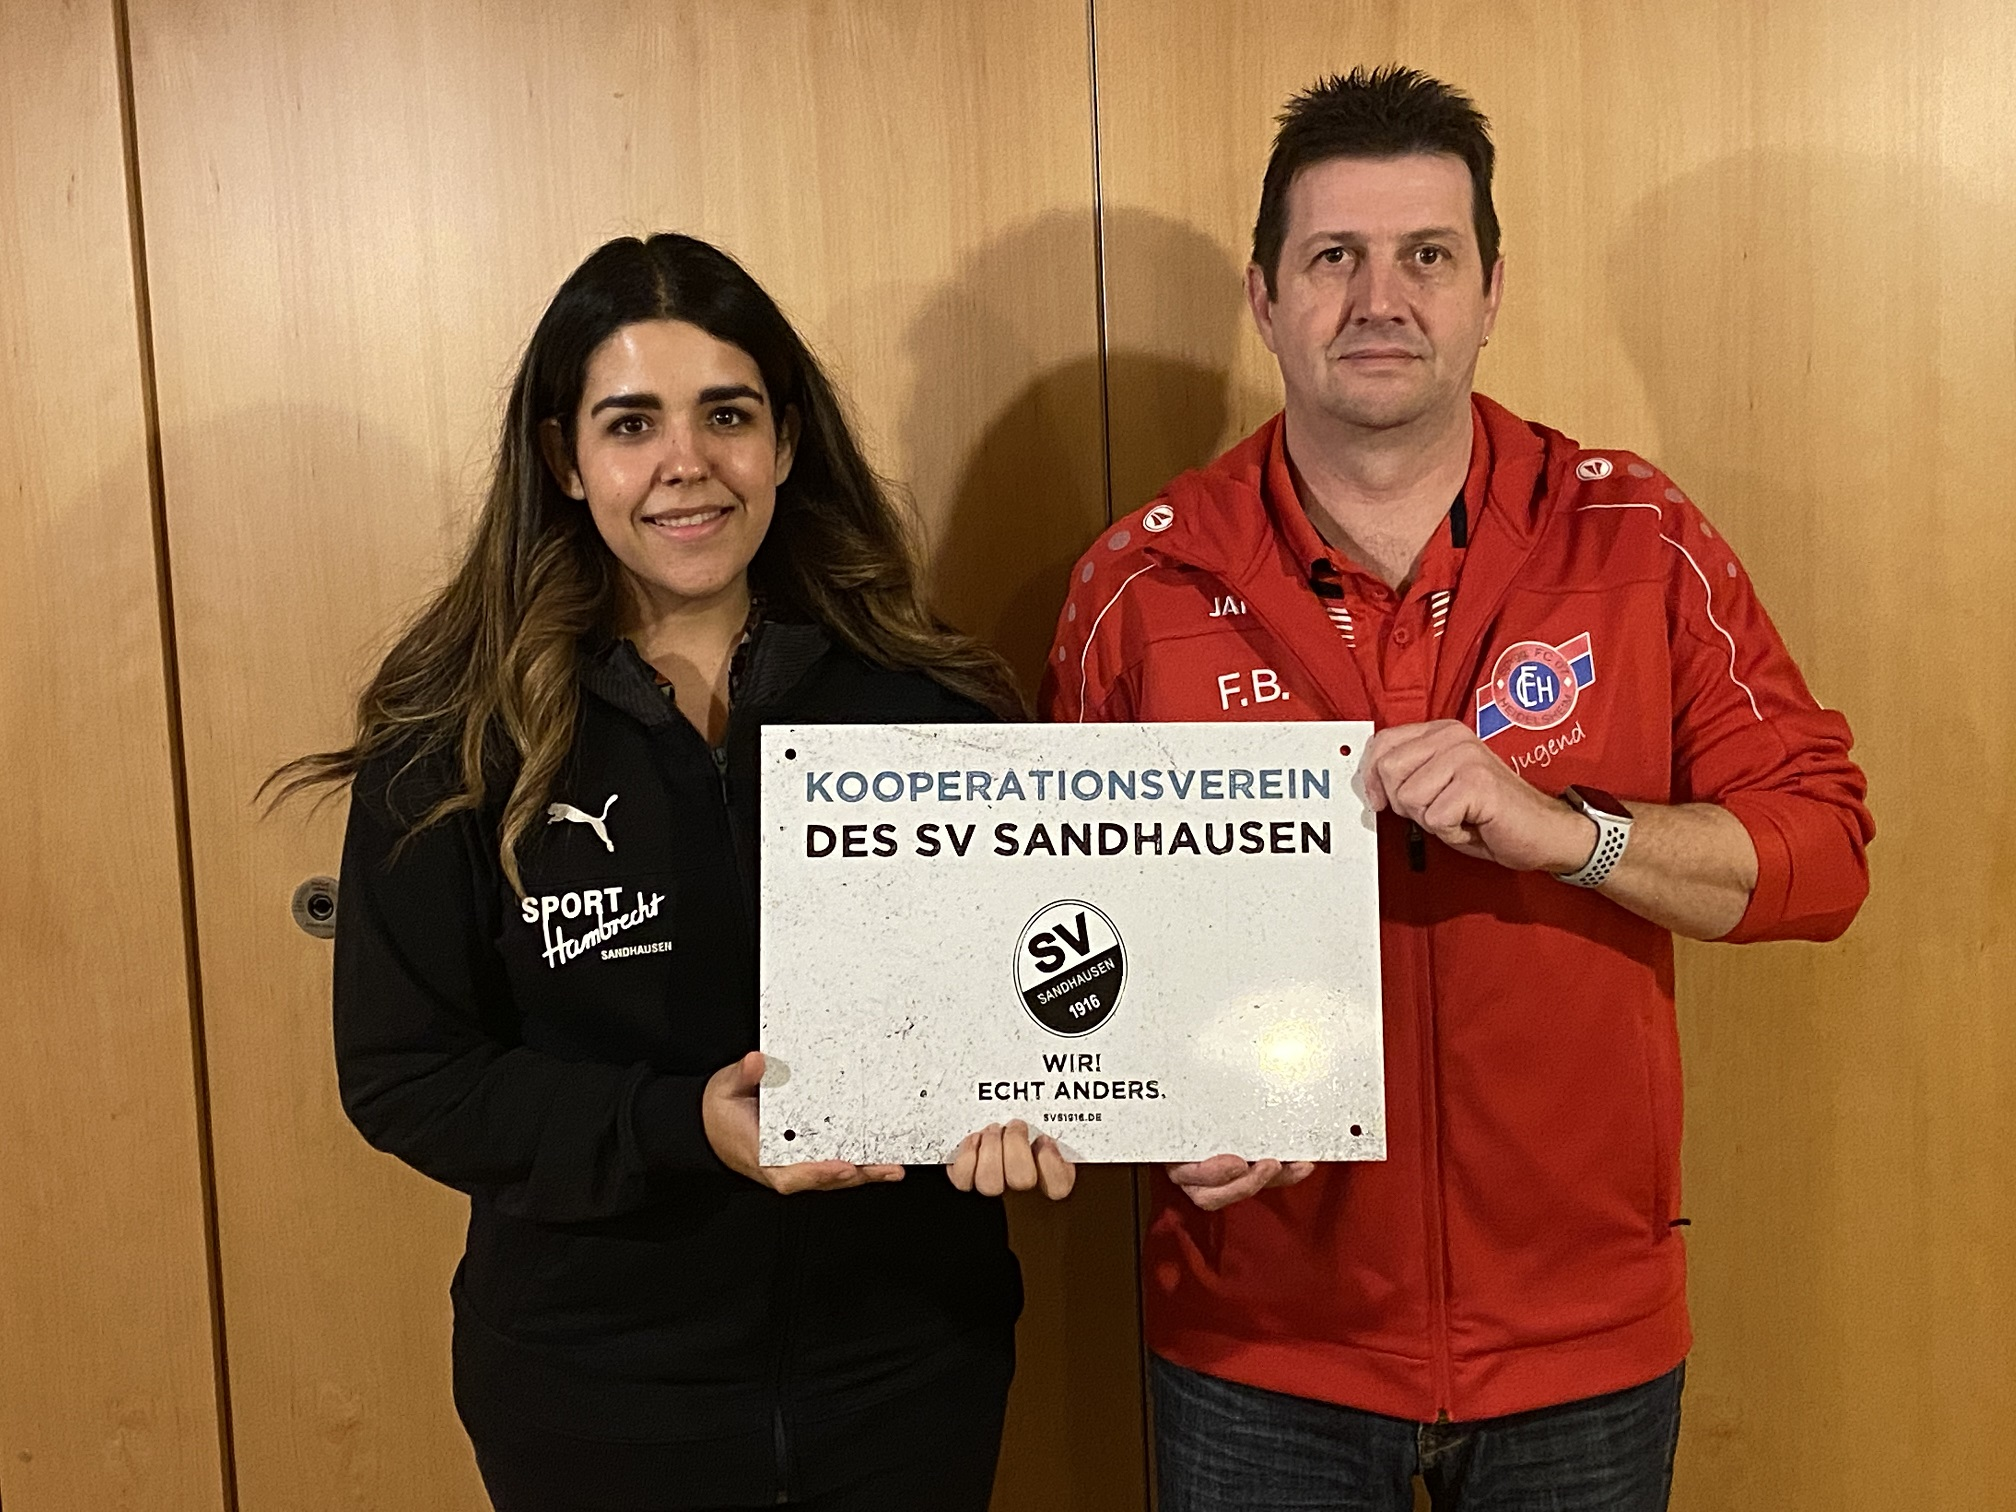 Kooperation mit dem SV Sandhausen!